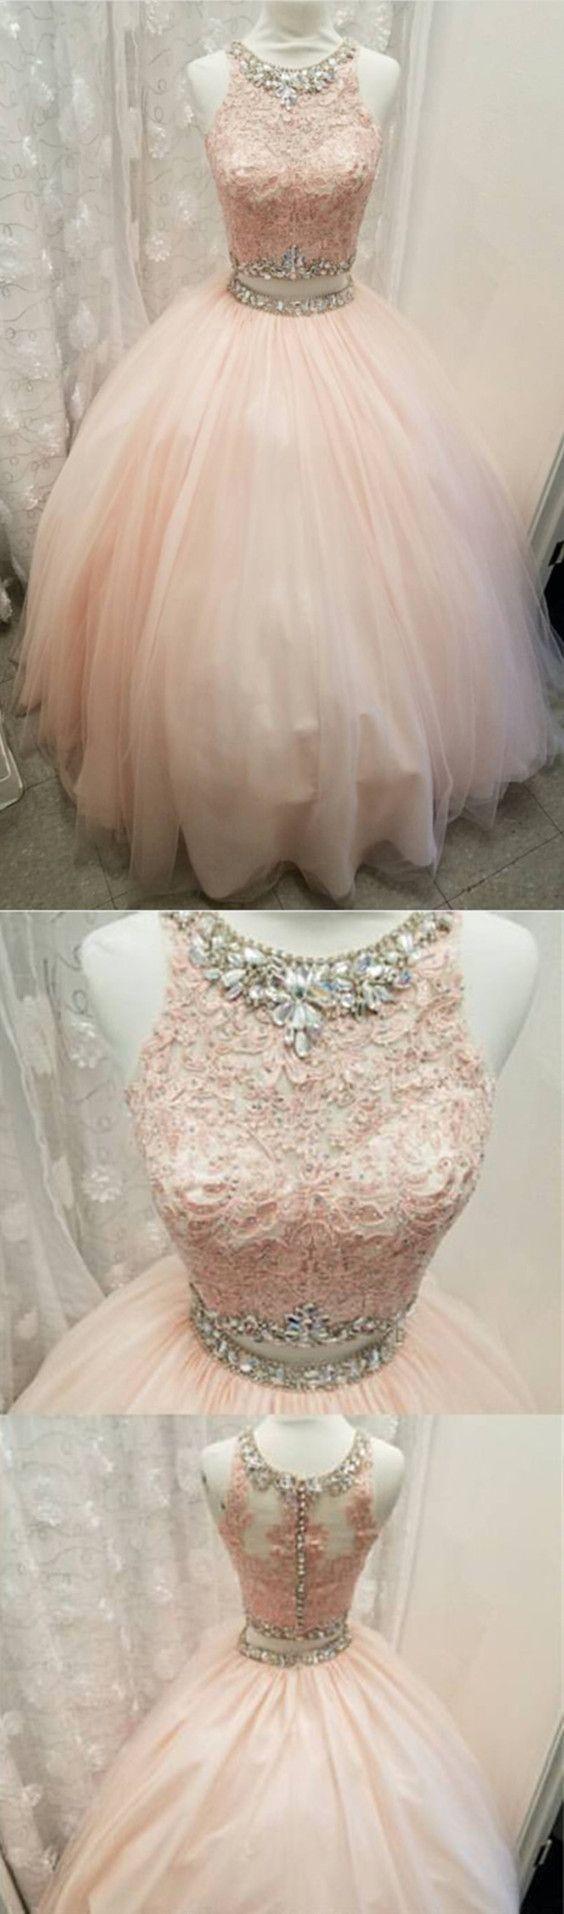 Ball Gowns Prom Dresses,Sweet Dresses,Elegant prom dress